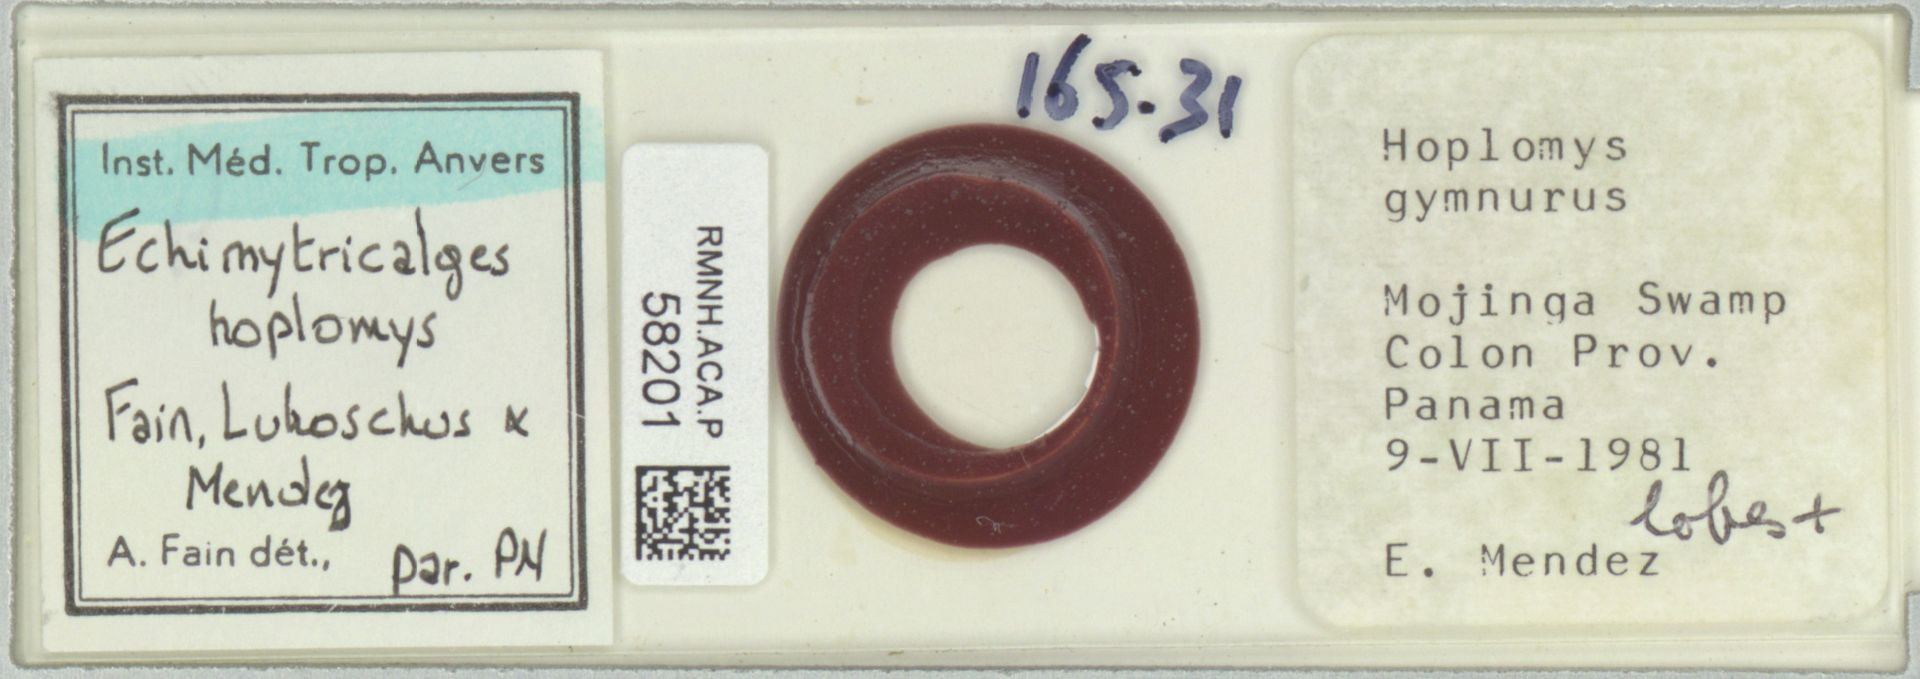 RMNH.ACA.P.58201 | Echimytricalges hoplomys Fain, Lukoschus & Mendez